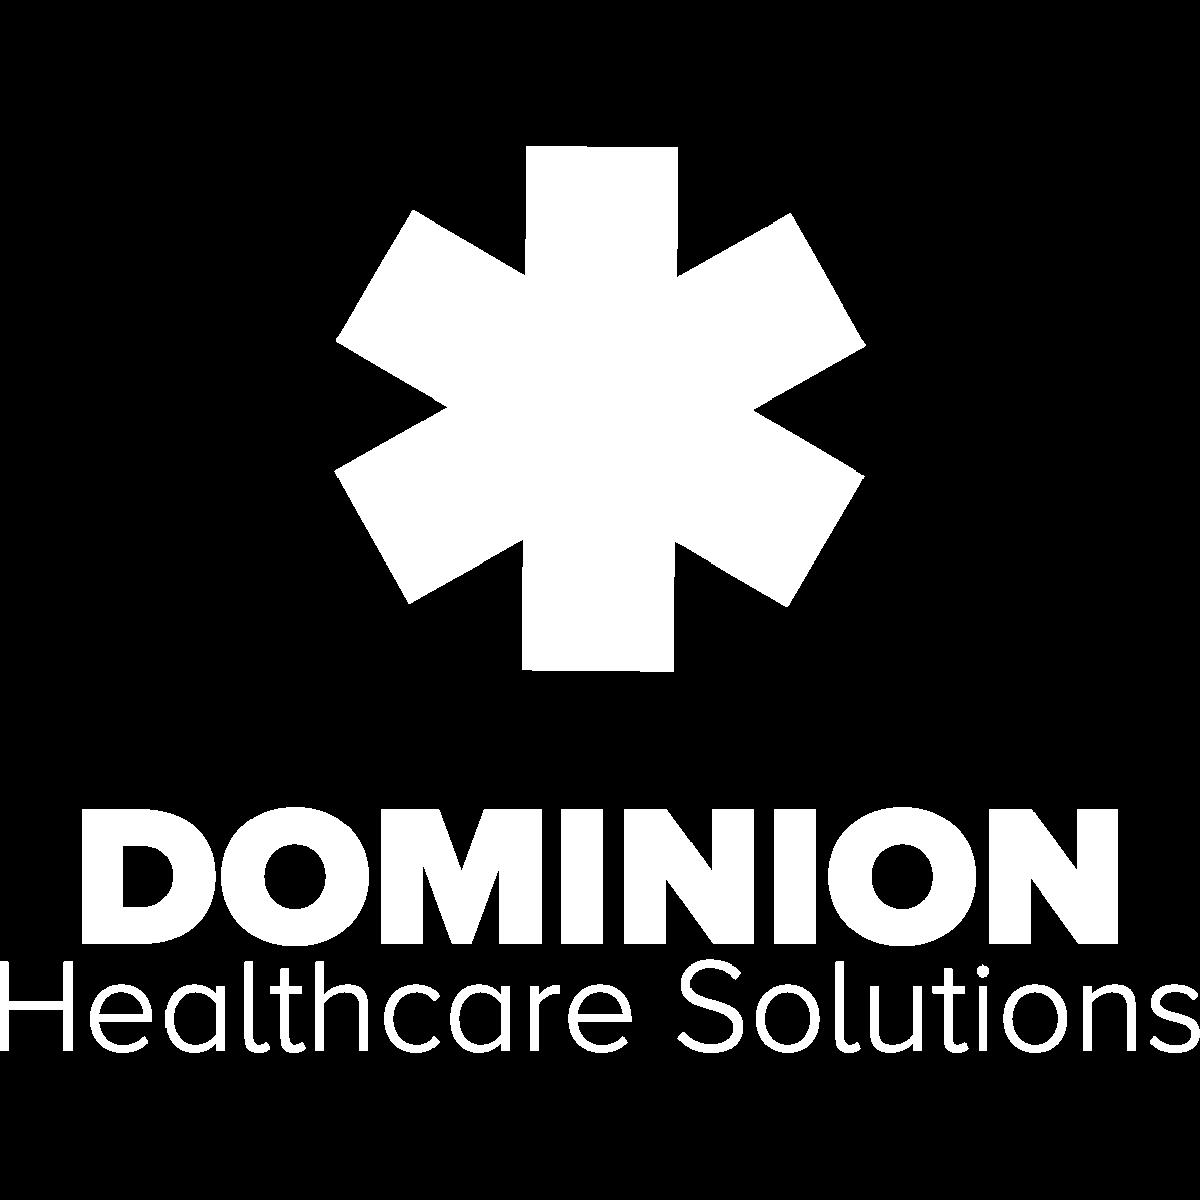 Dominion Healthcare Solutions